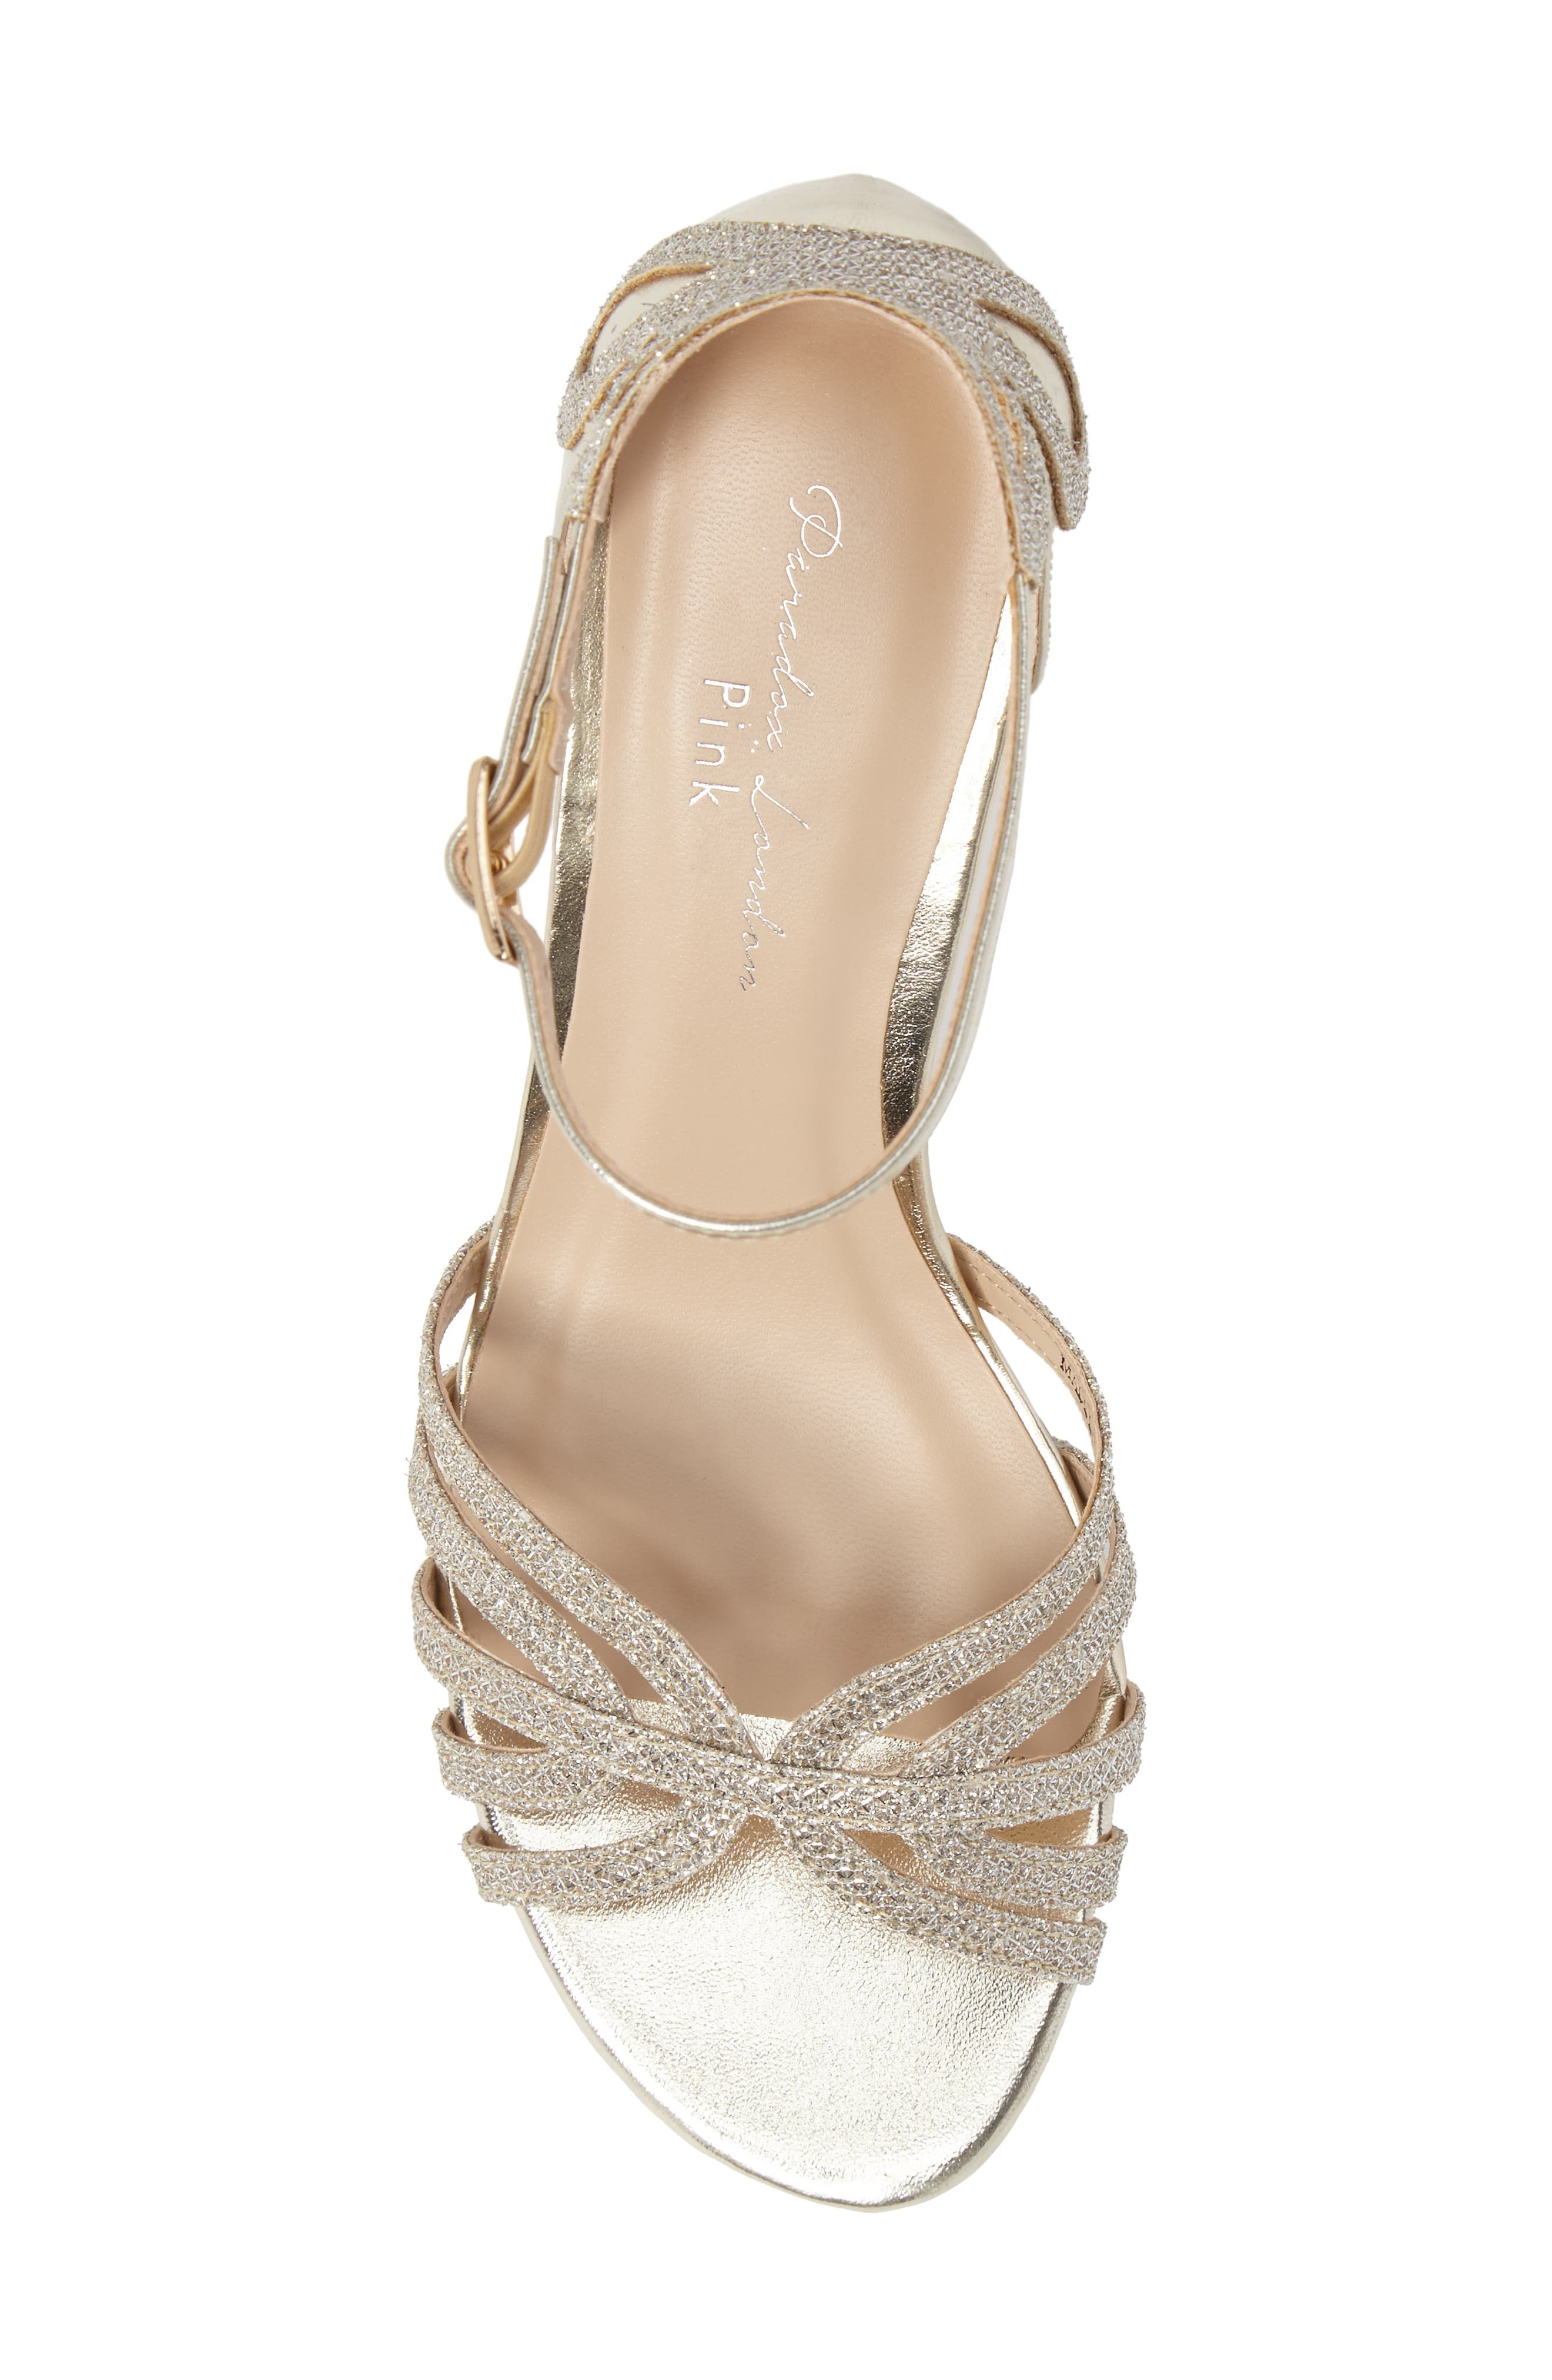 Melby Ankle Strap Sandal,                             Alternate thumbnail 5, color,                             Champagne